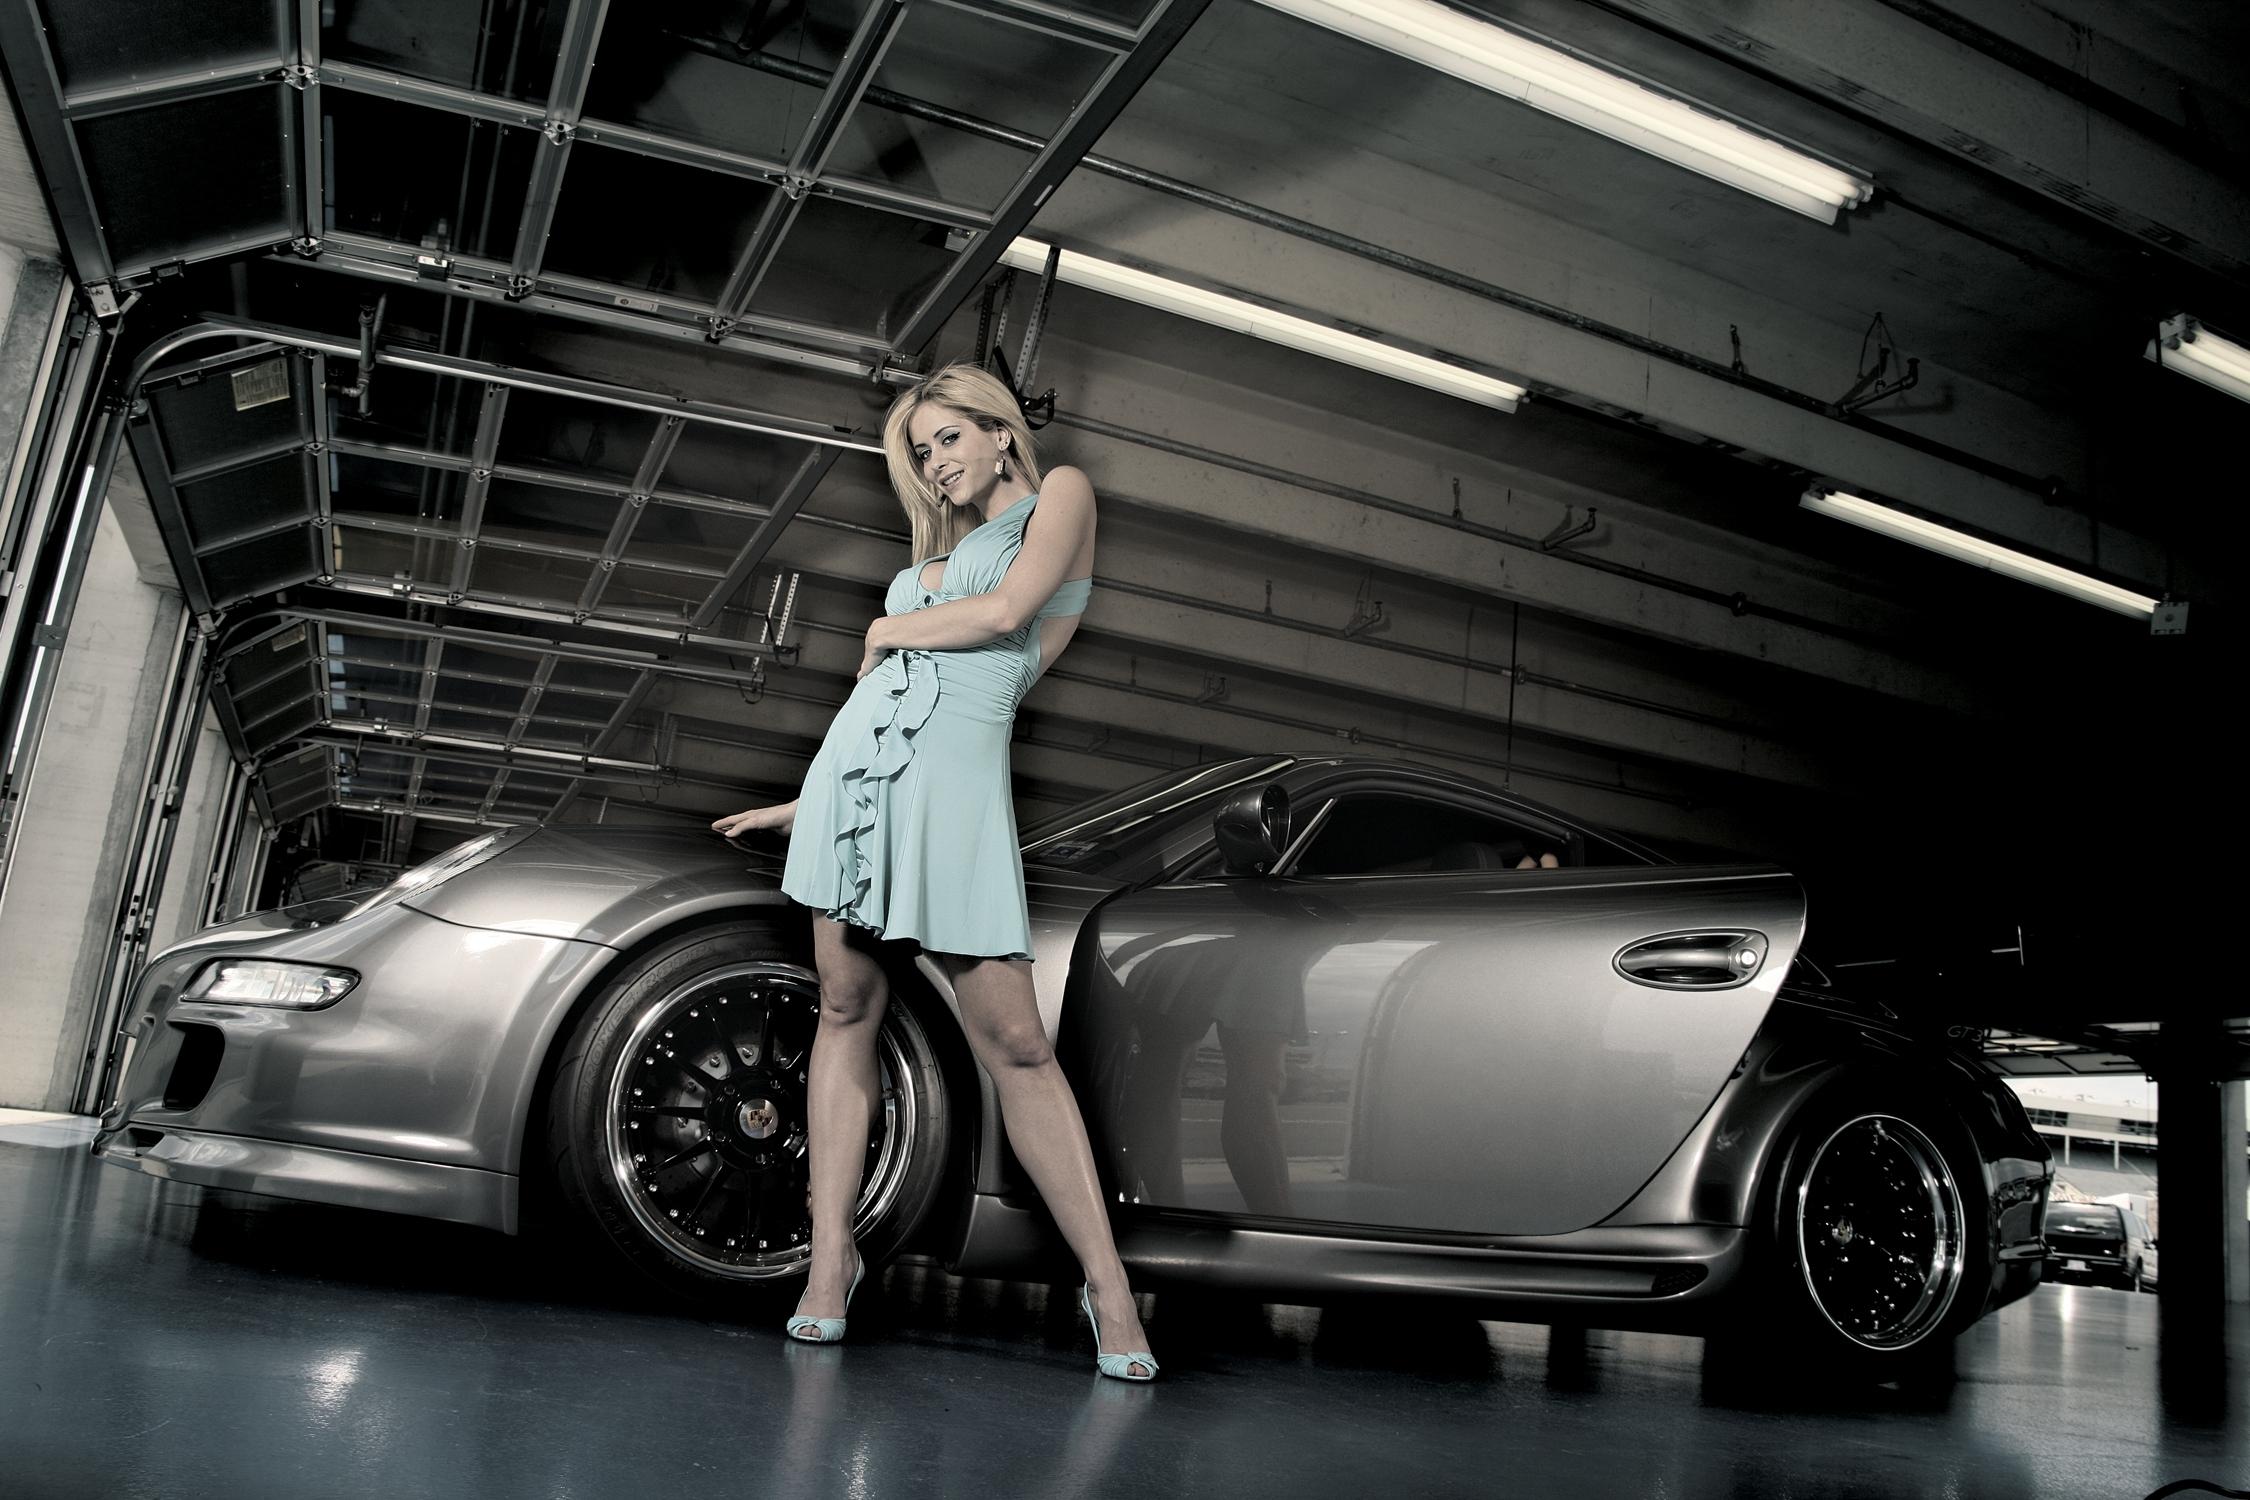 3840x1080 Wallpaper Classic Car Girls Amp Cars Hd Wallpaper Background Image 2250x1500